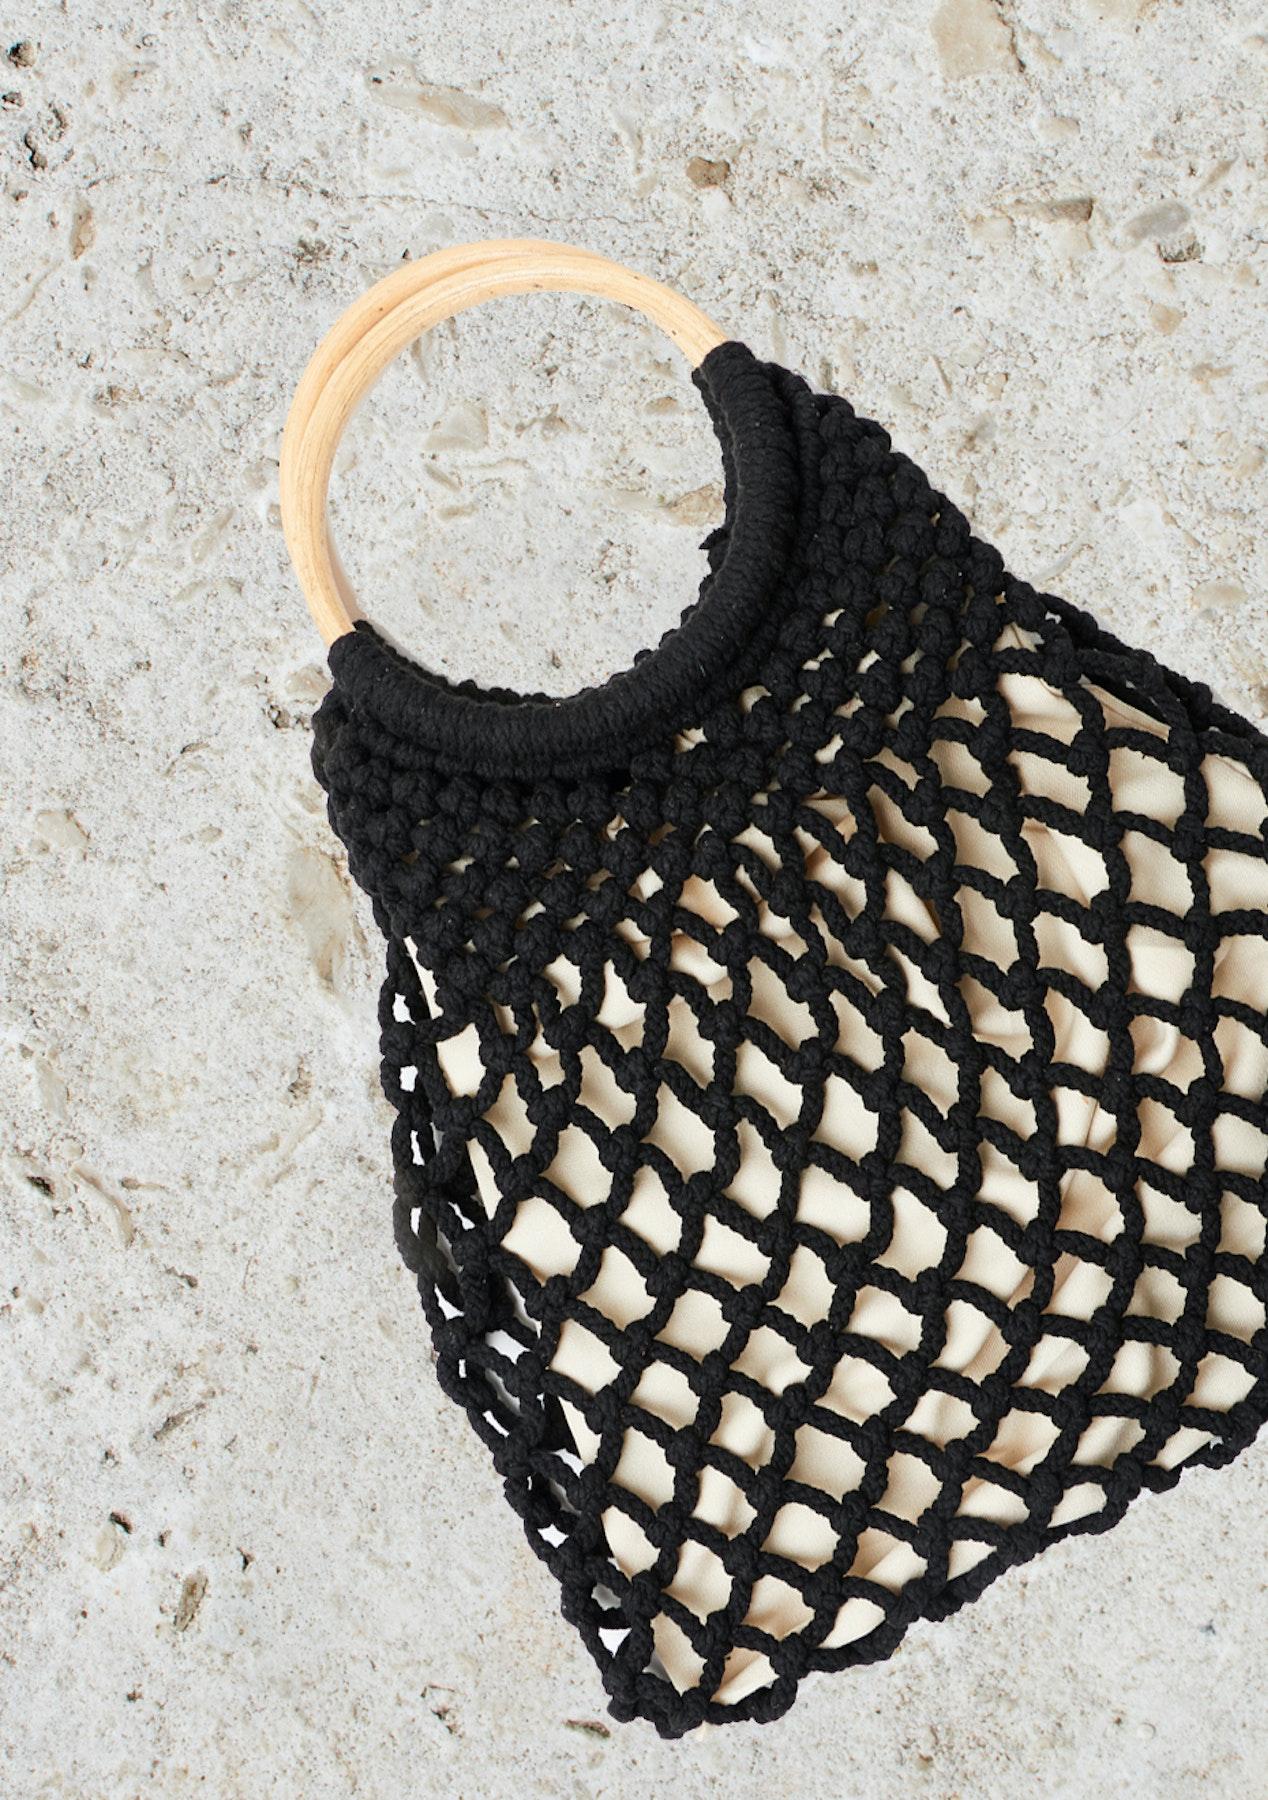 Circular Wooden Handle Net Handbag Black